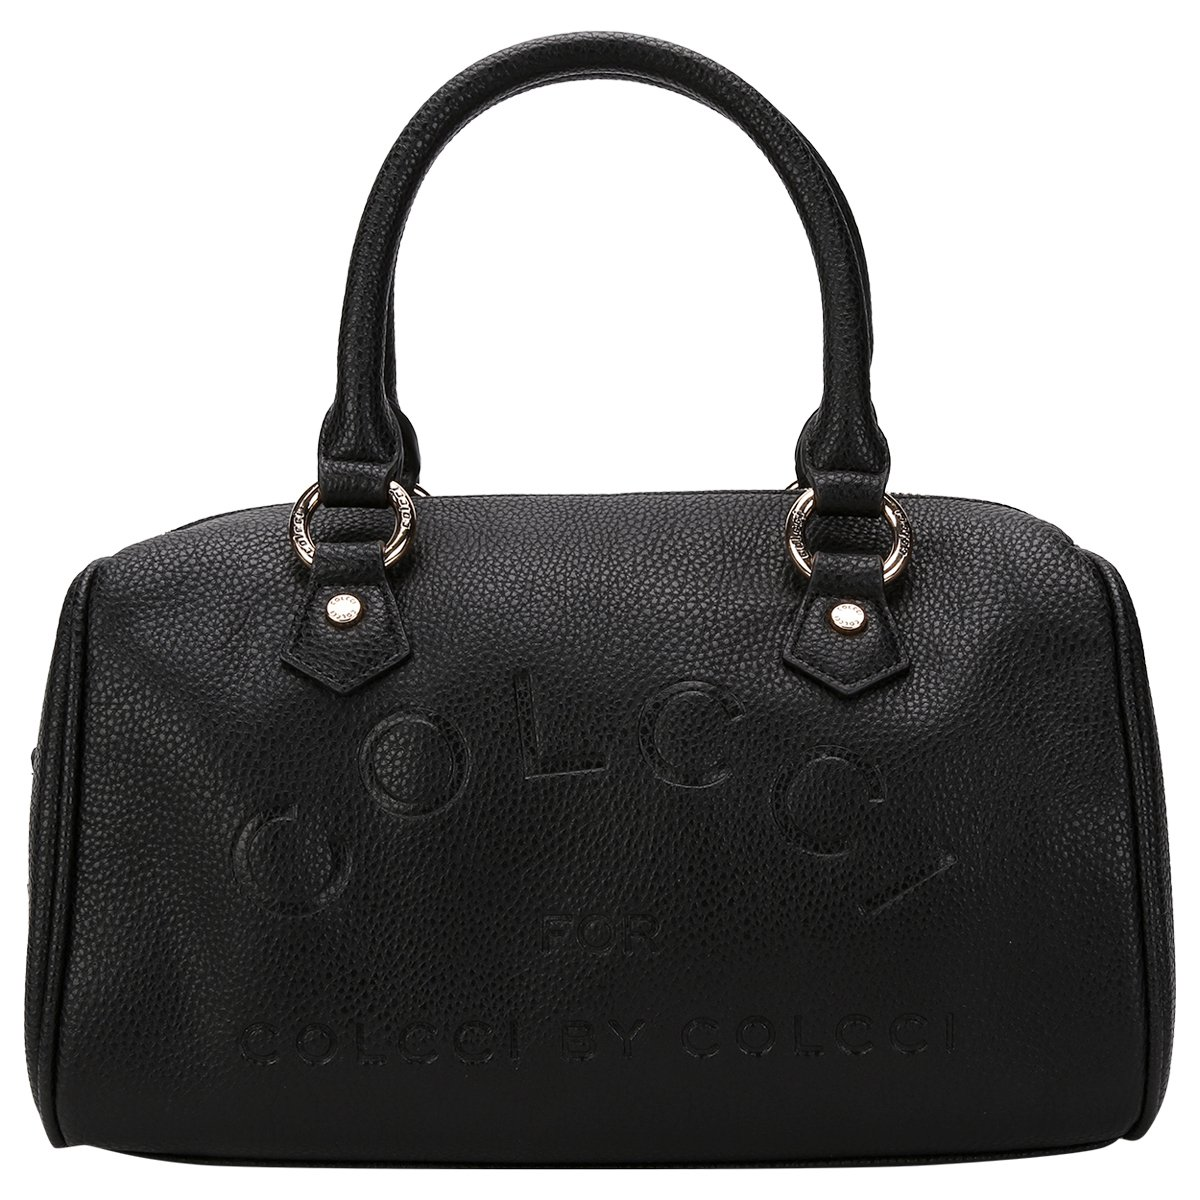 23e20f2a373cb Bolsa Colcci Baú Colcci By Colcci - Compre Agora   Netshoes